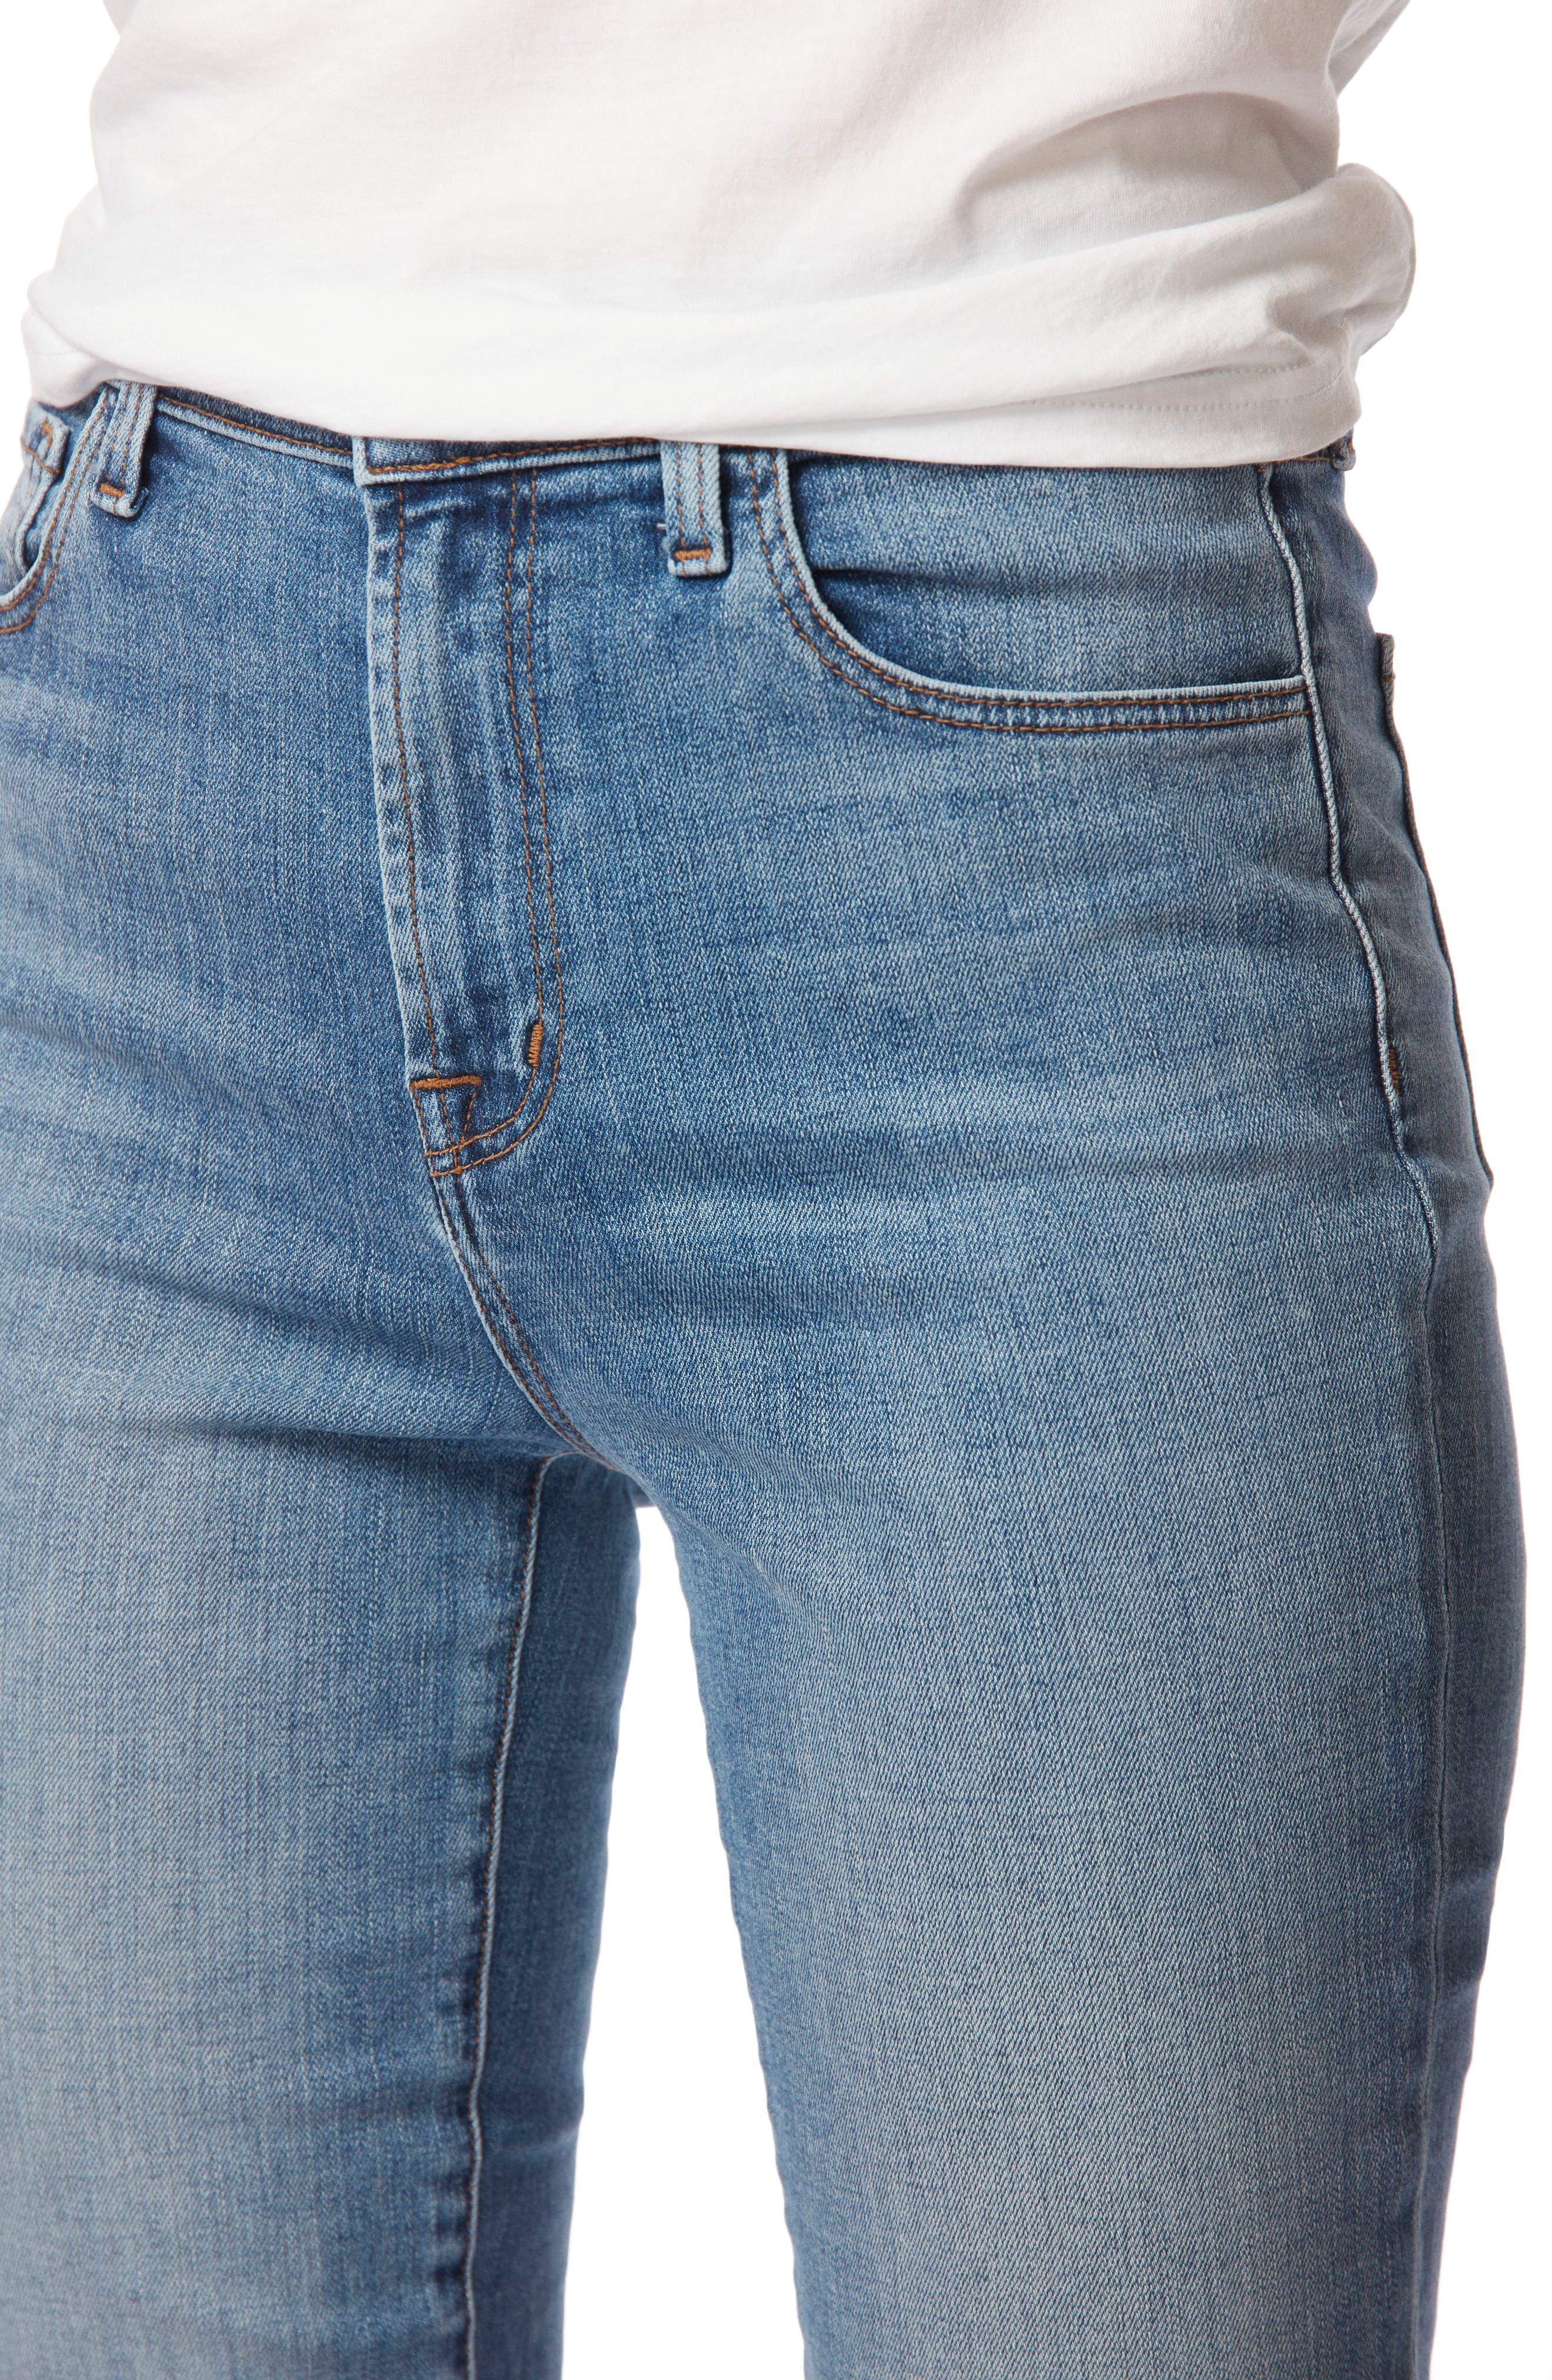 Carolina Super High Waist Skinny Jeans,                             Alternate thumbnail 4, color,                             400